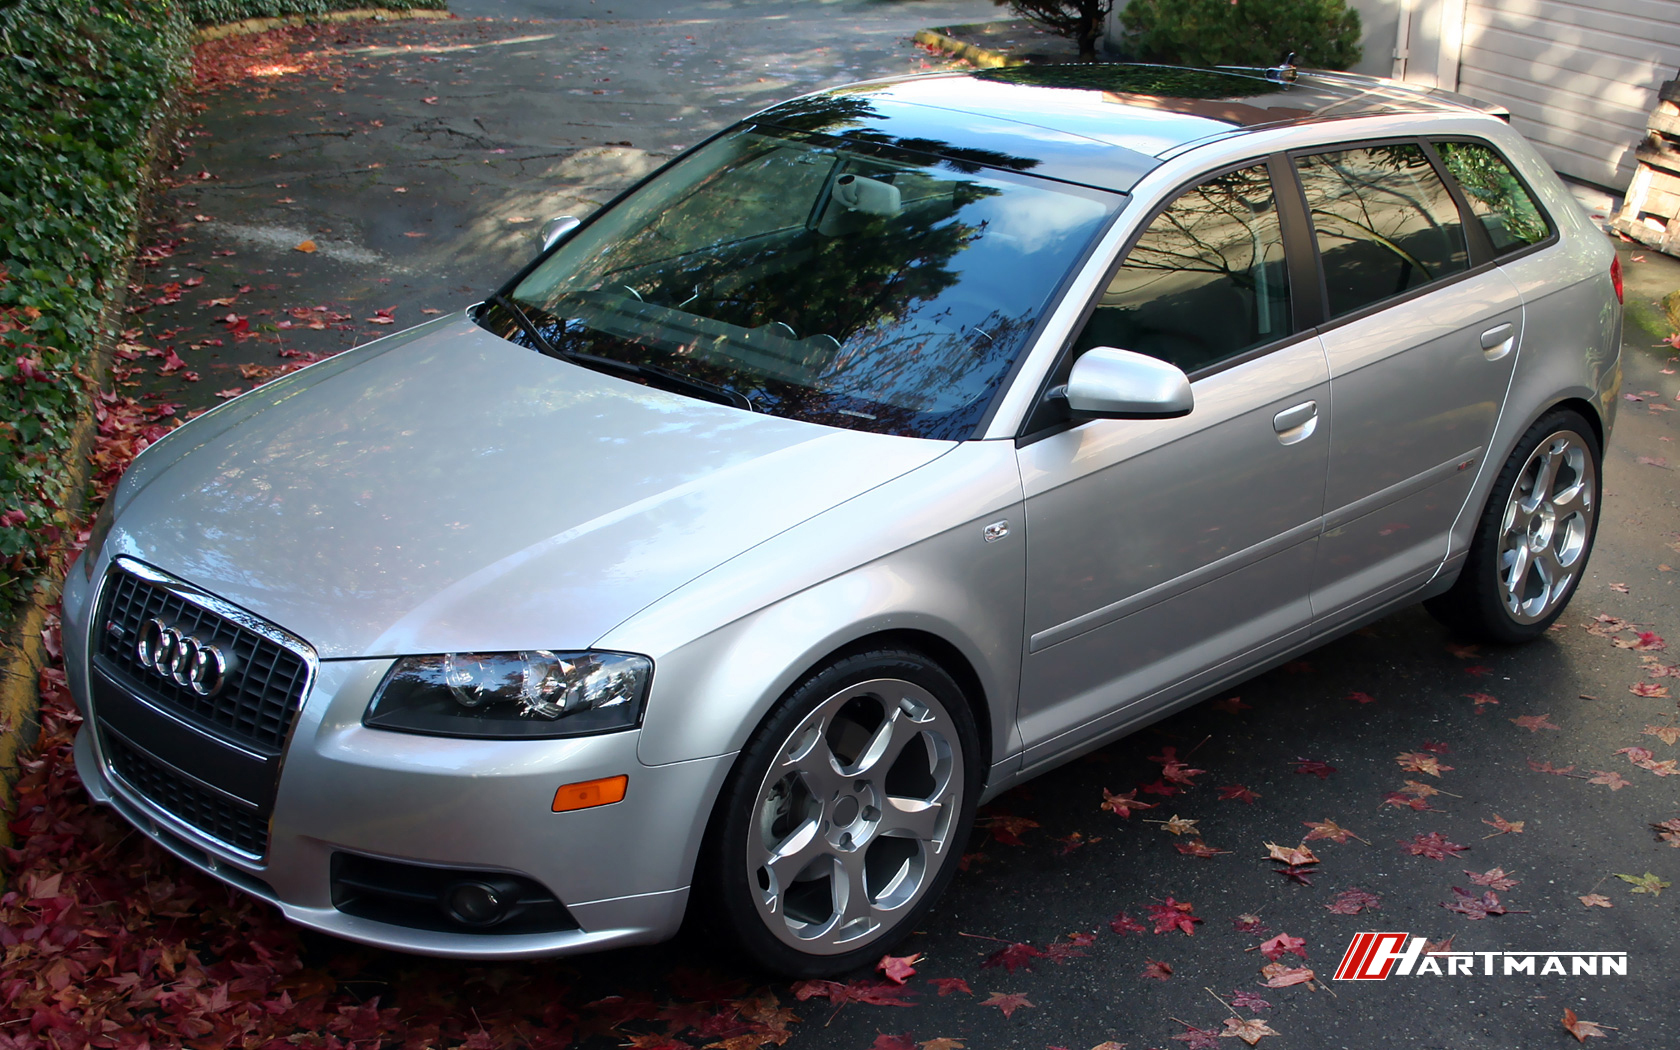 Audi 8p a3 hartmann g5 gs 19 kw1 hwm